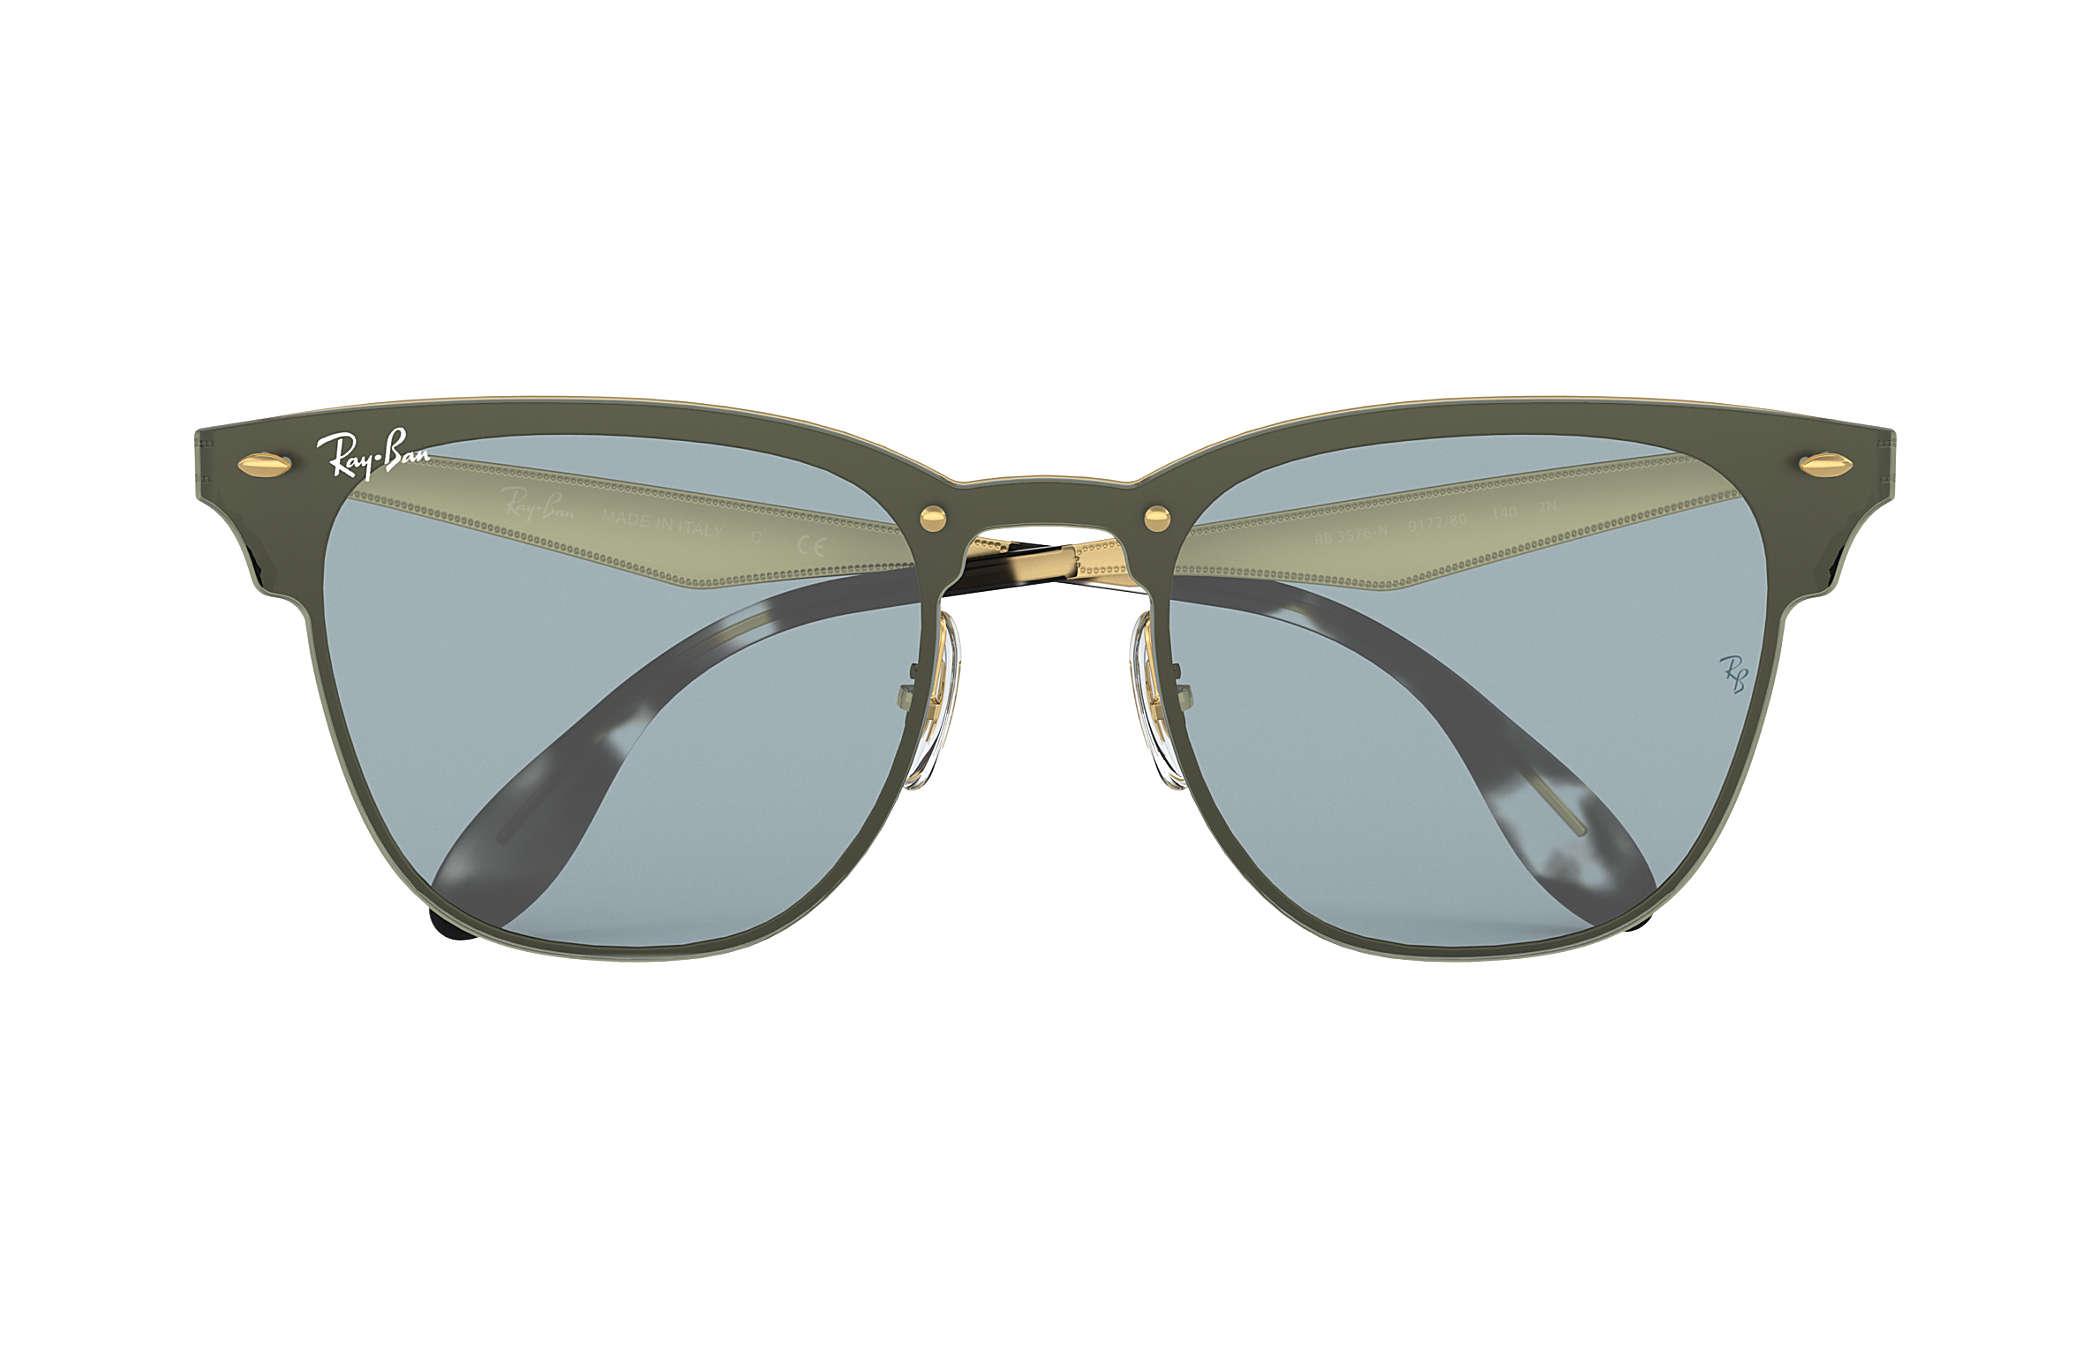 e24f6ae474 Ray-Ban Blaze Clubmaster RB3576N Gold - Steel - Blue Lenses ...